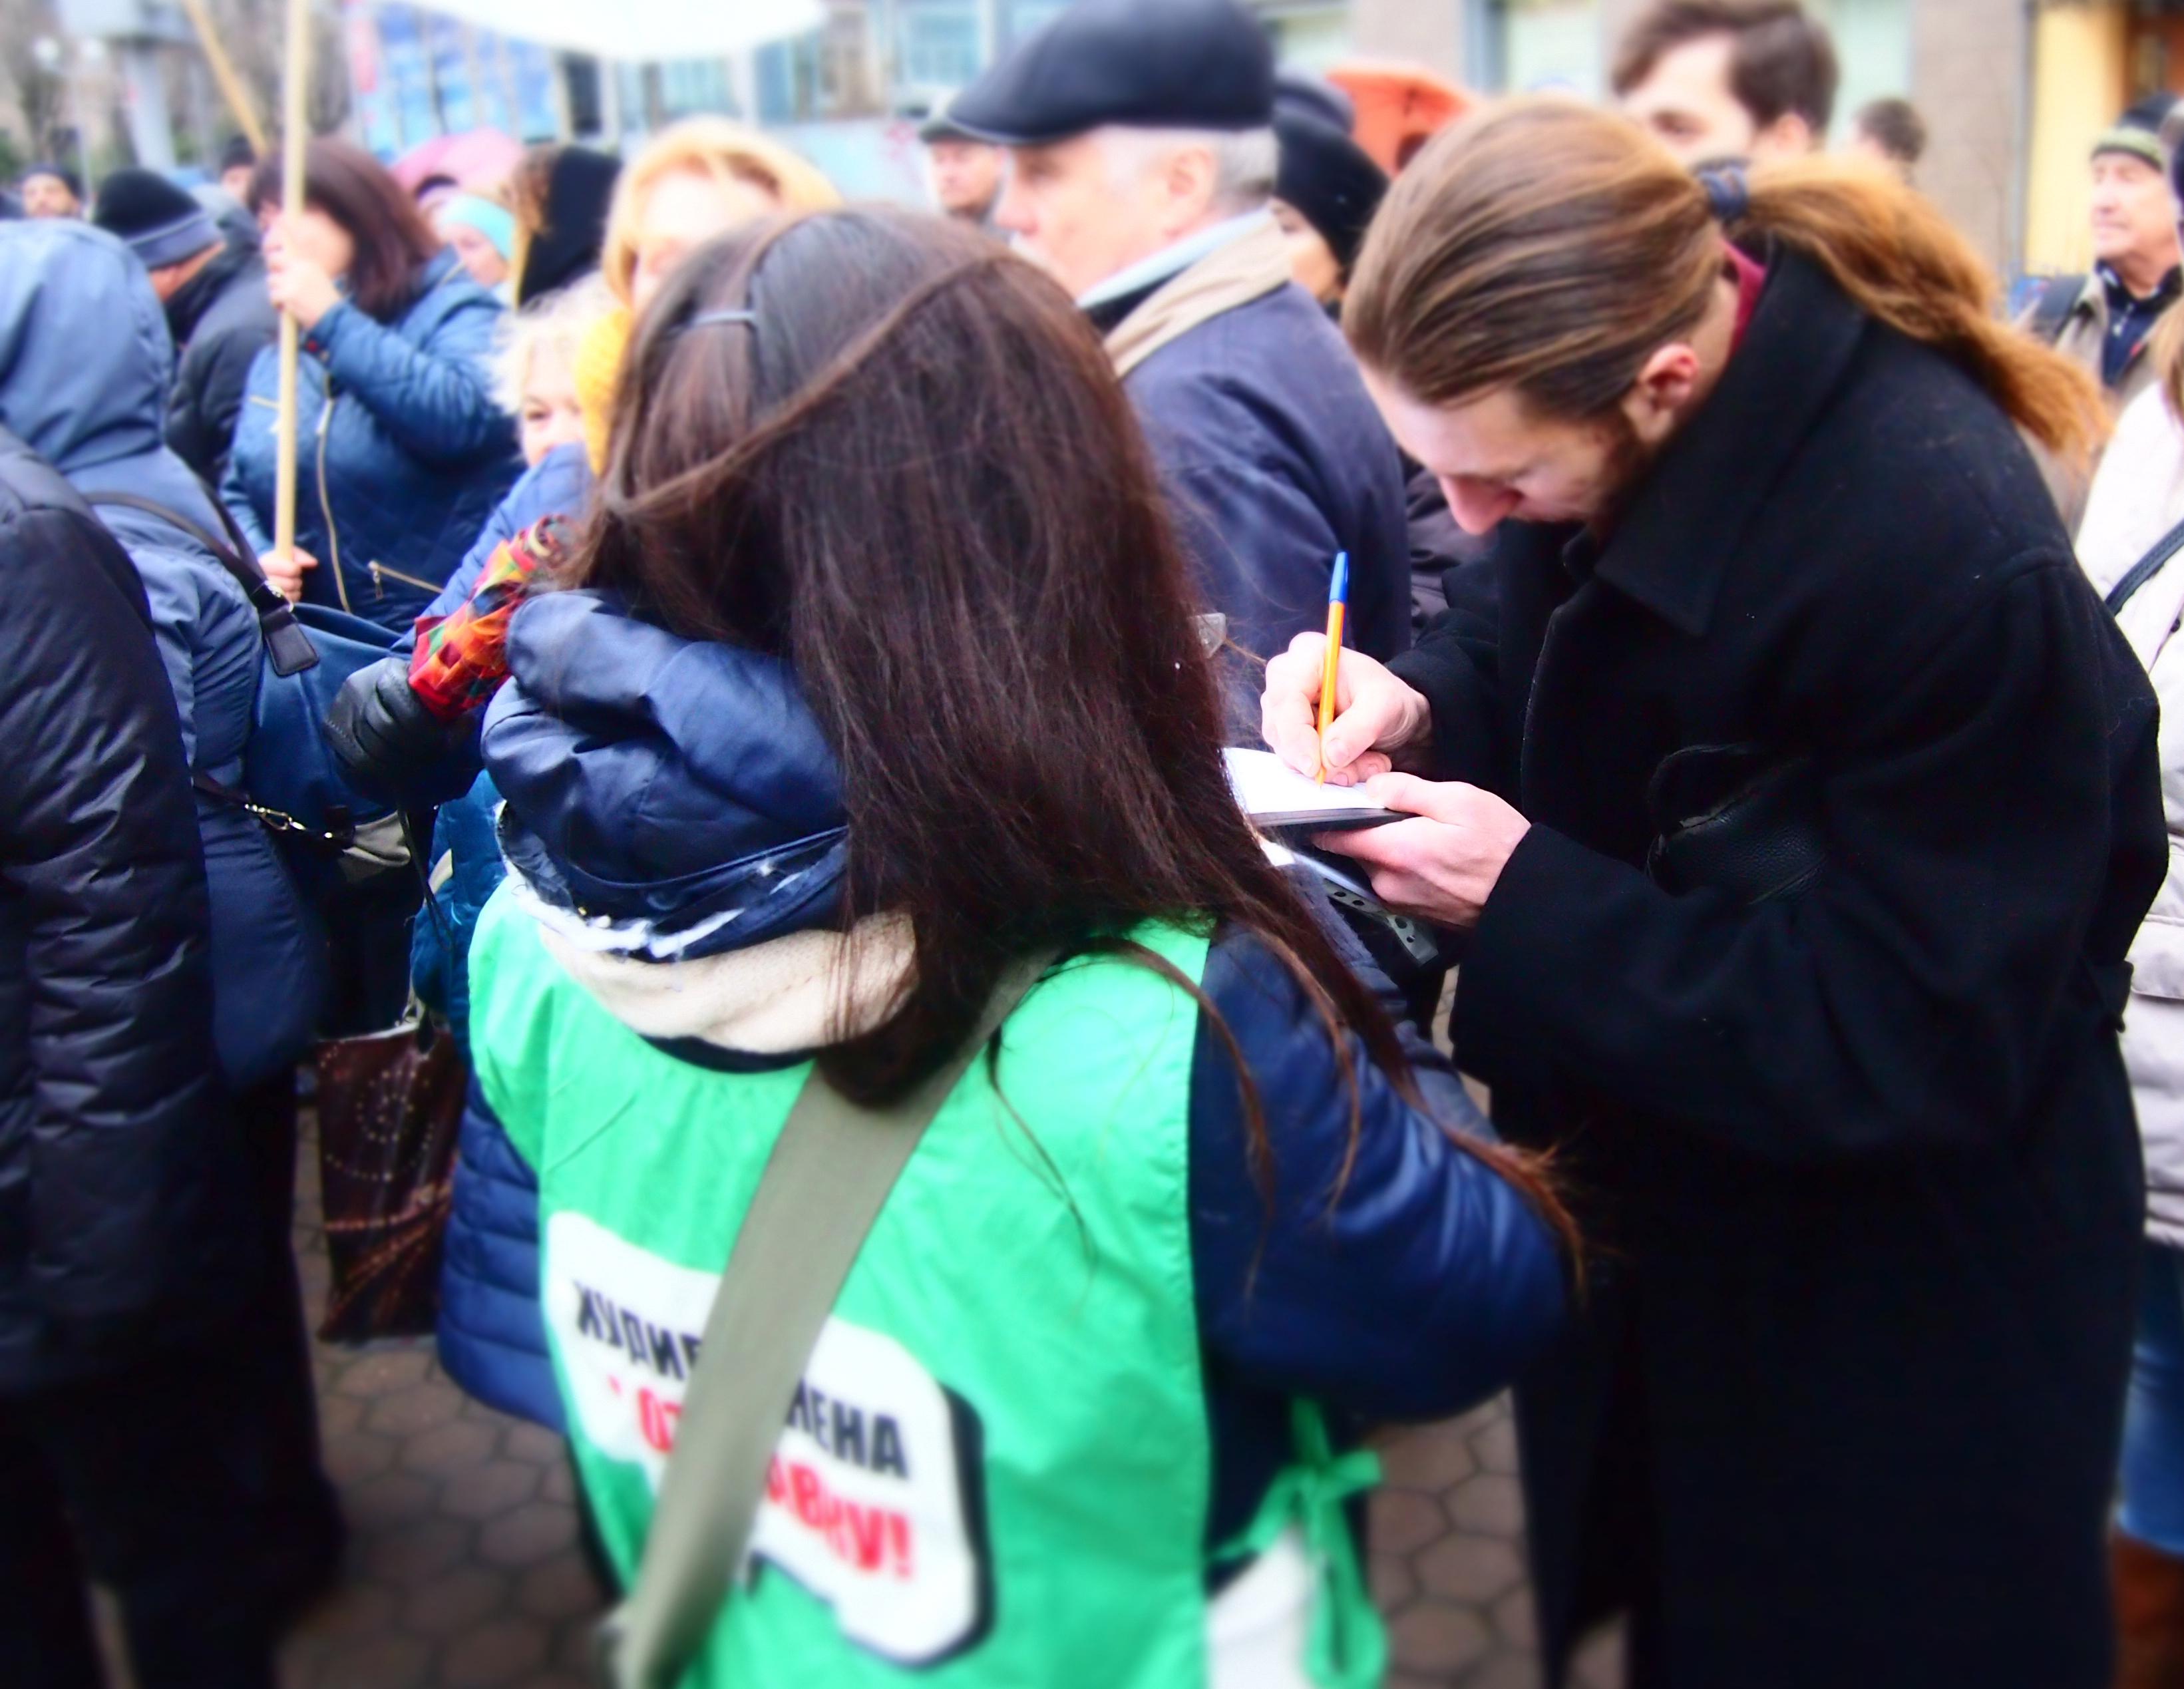 Сбор подписей за отставку Худилайнена. Фото: Валерий Поташов